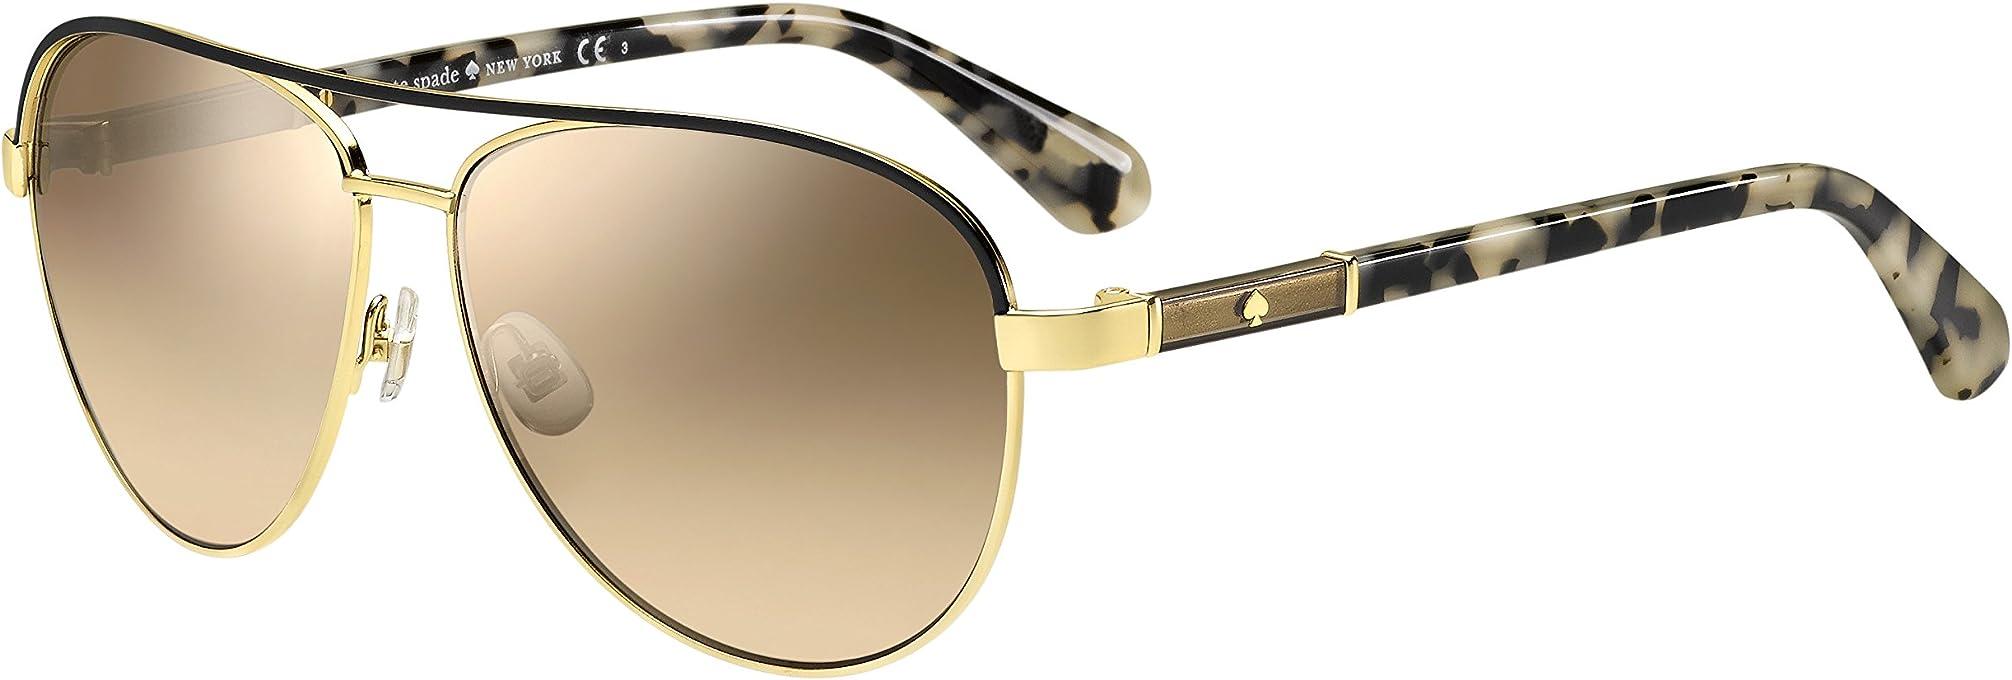 Kate Spade EMILYANNS Aviator 59 mm Sunglasses